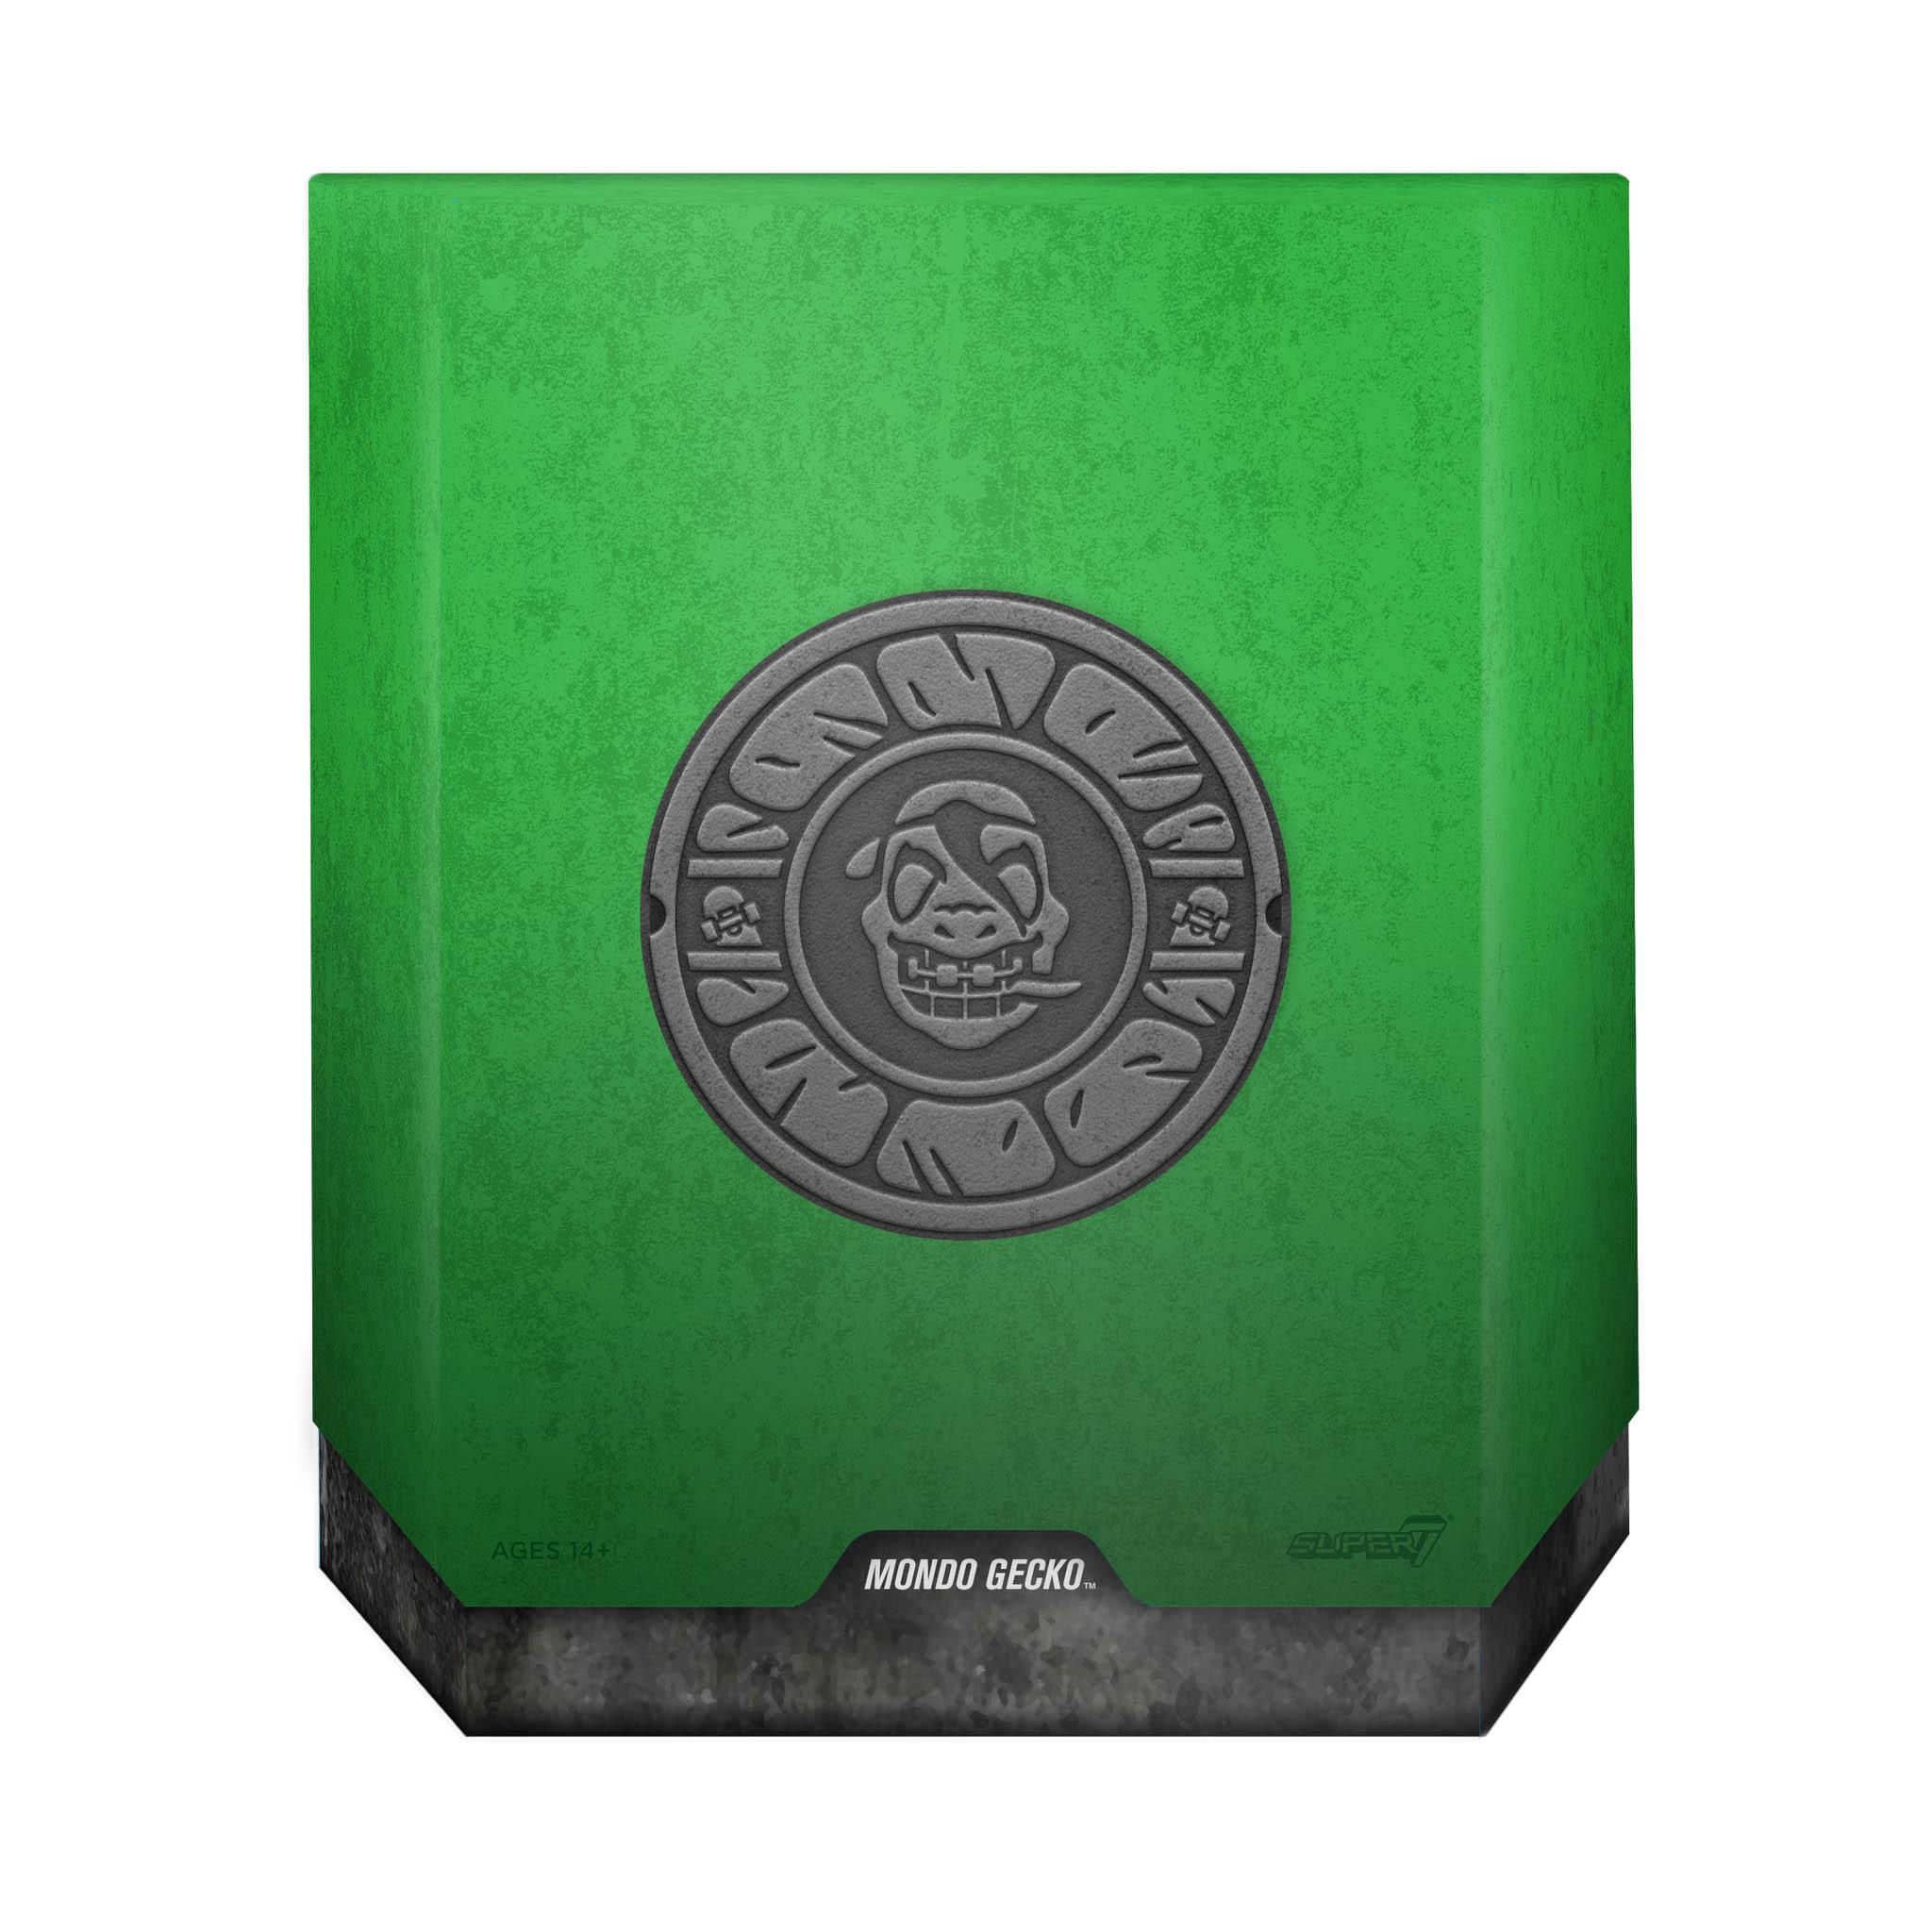 Super7-TMNT-Ultimates-Mondo-Gecko-002